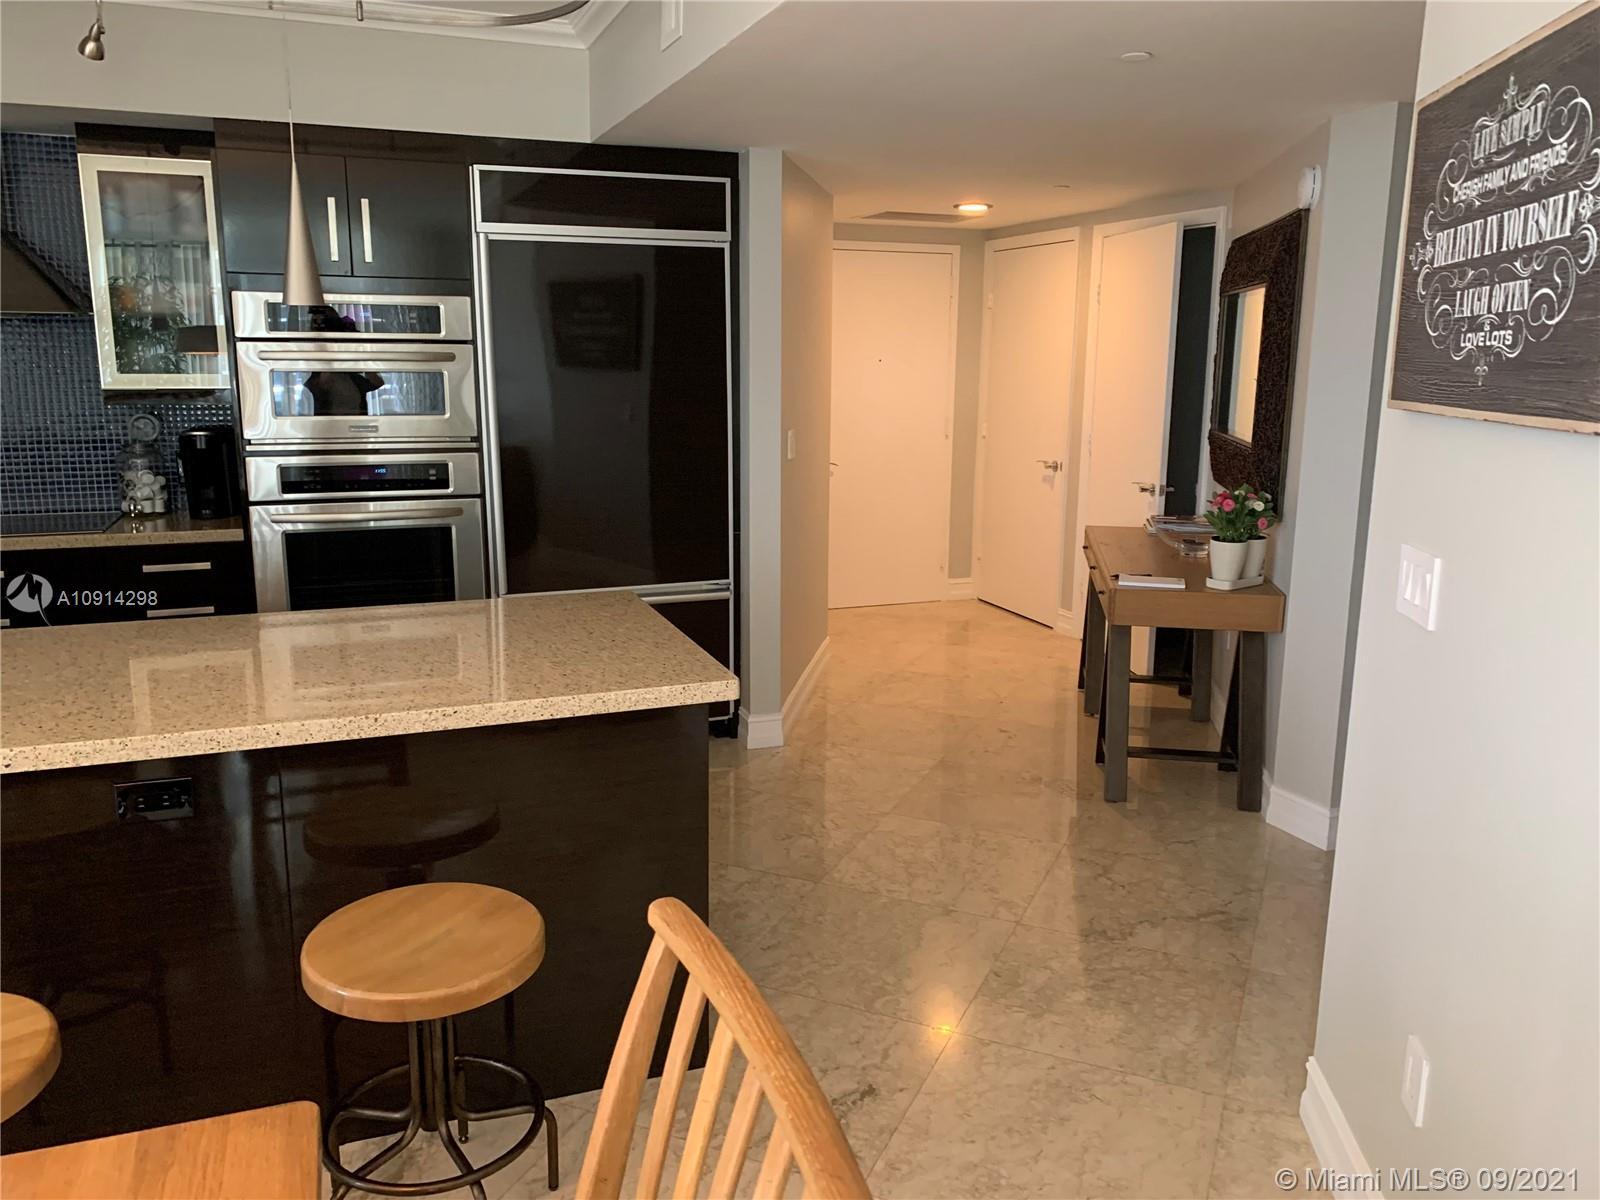 4006 2 / 2 1458 sq. ft. $ 2020-10-02 0 Photo